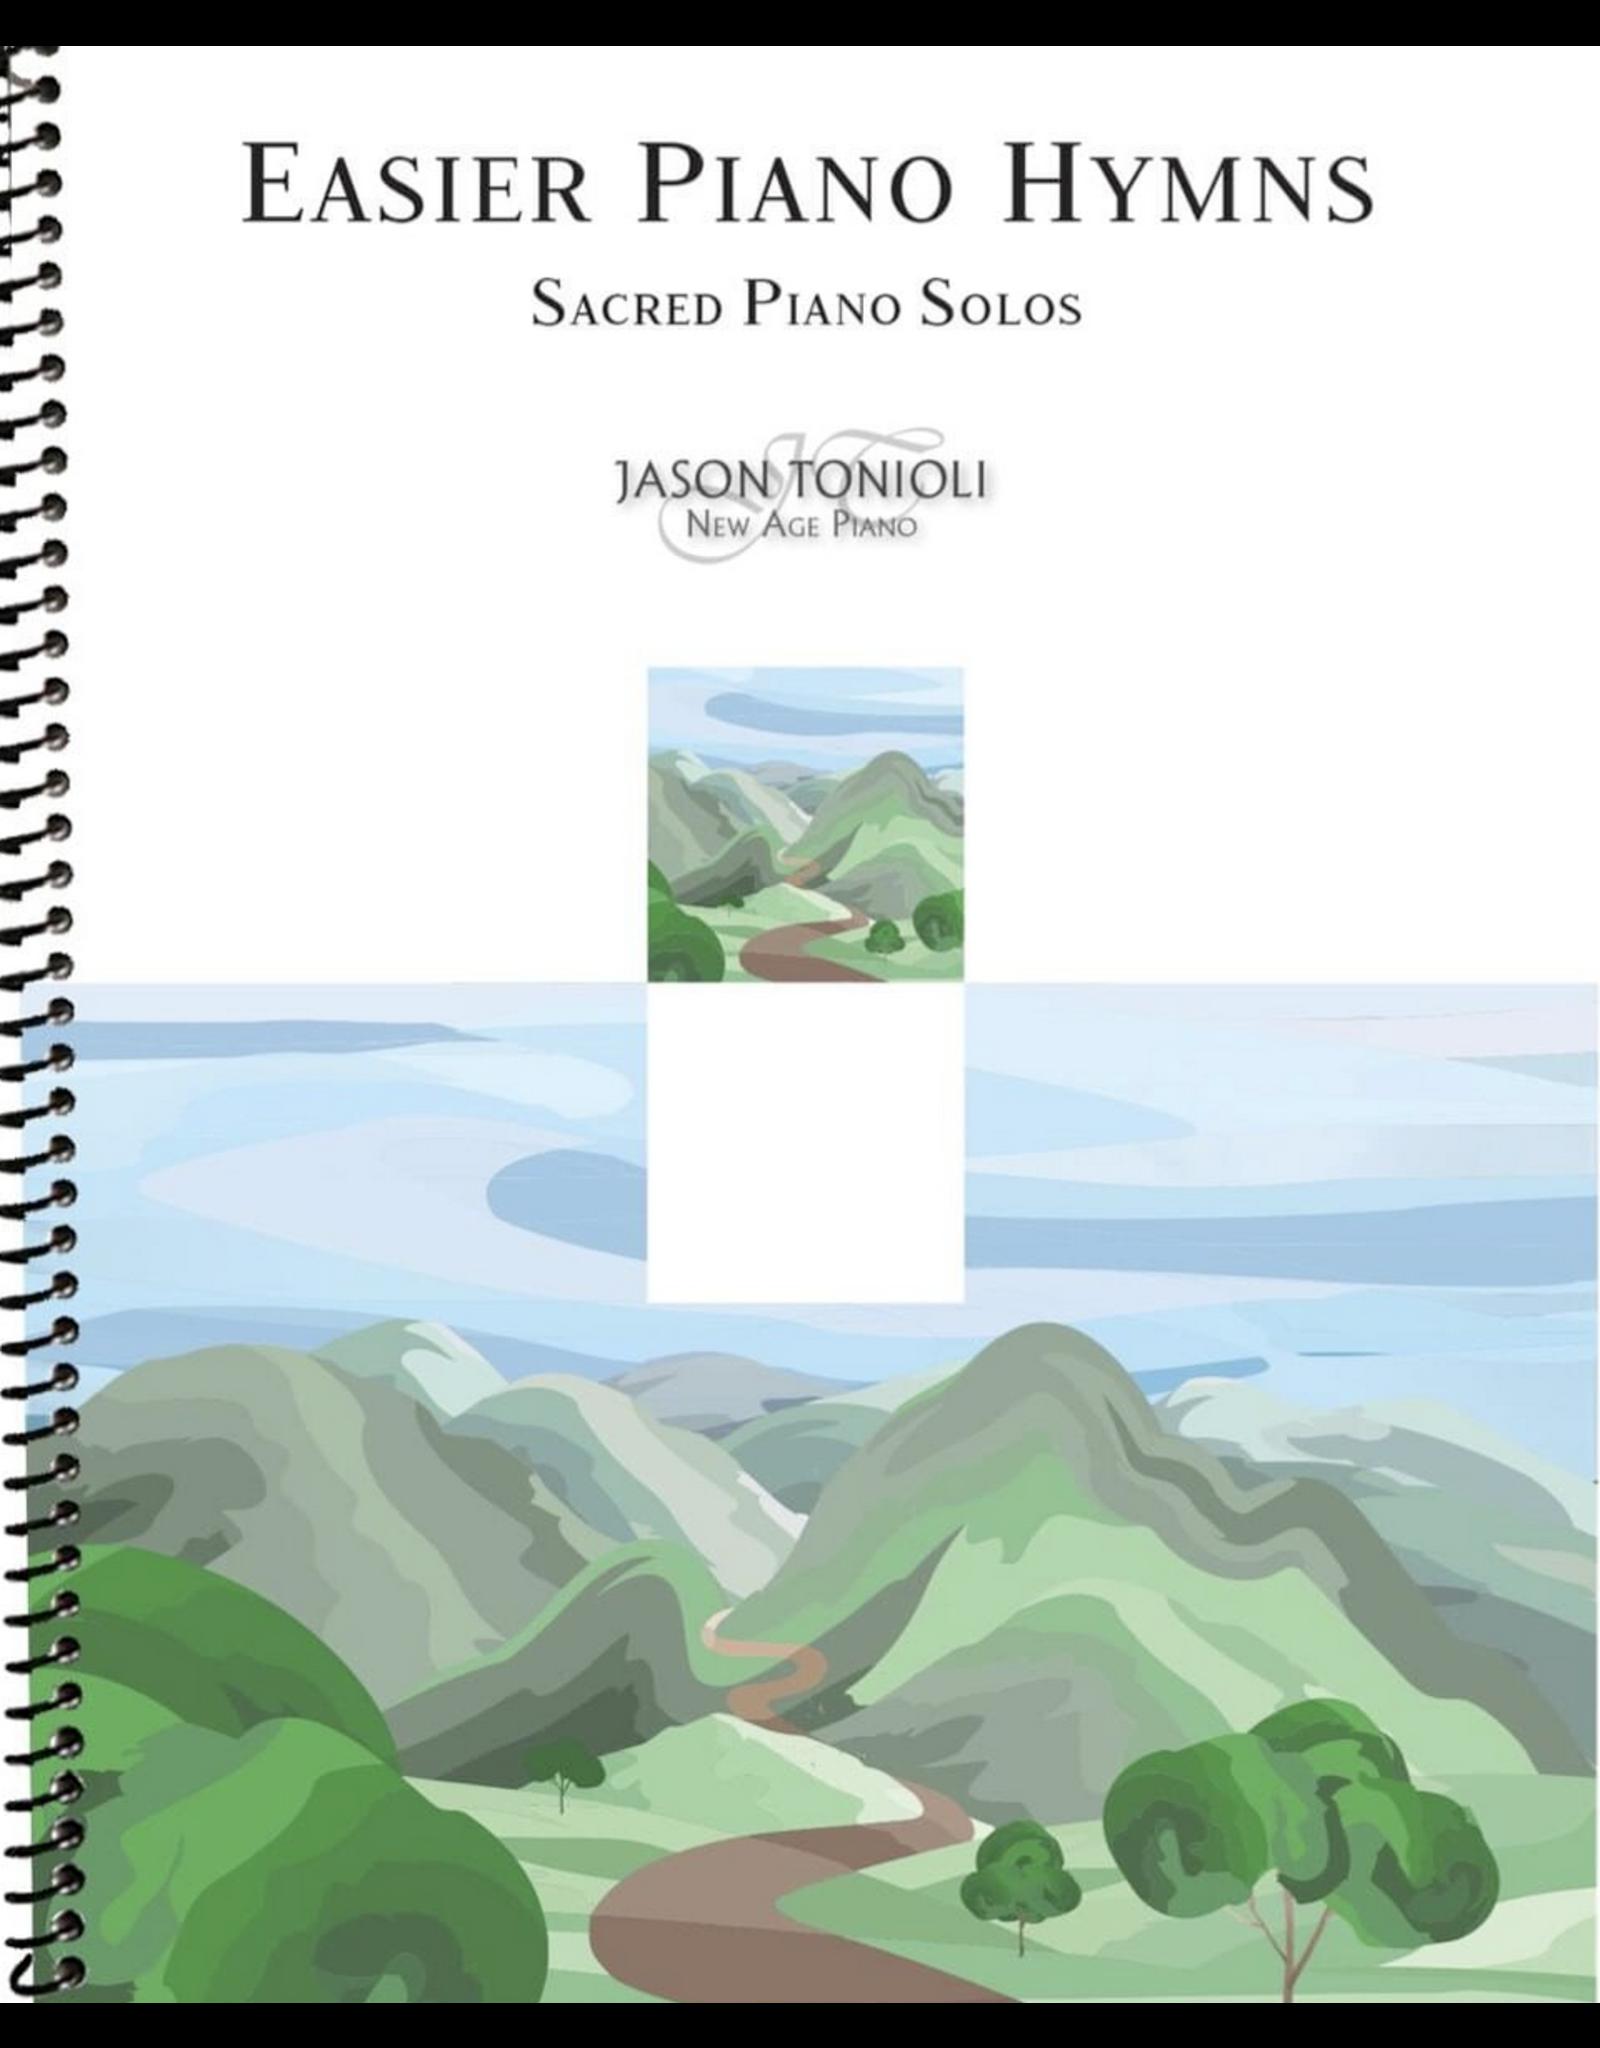 Jason Tonioli Easier Piano Hymns - Sacred Piano Solos arr. Jason Tonioli